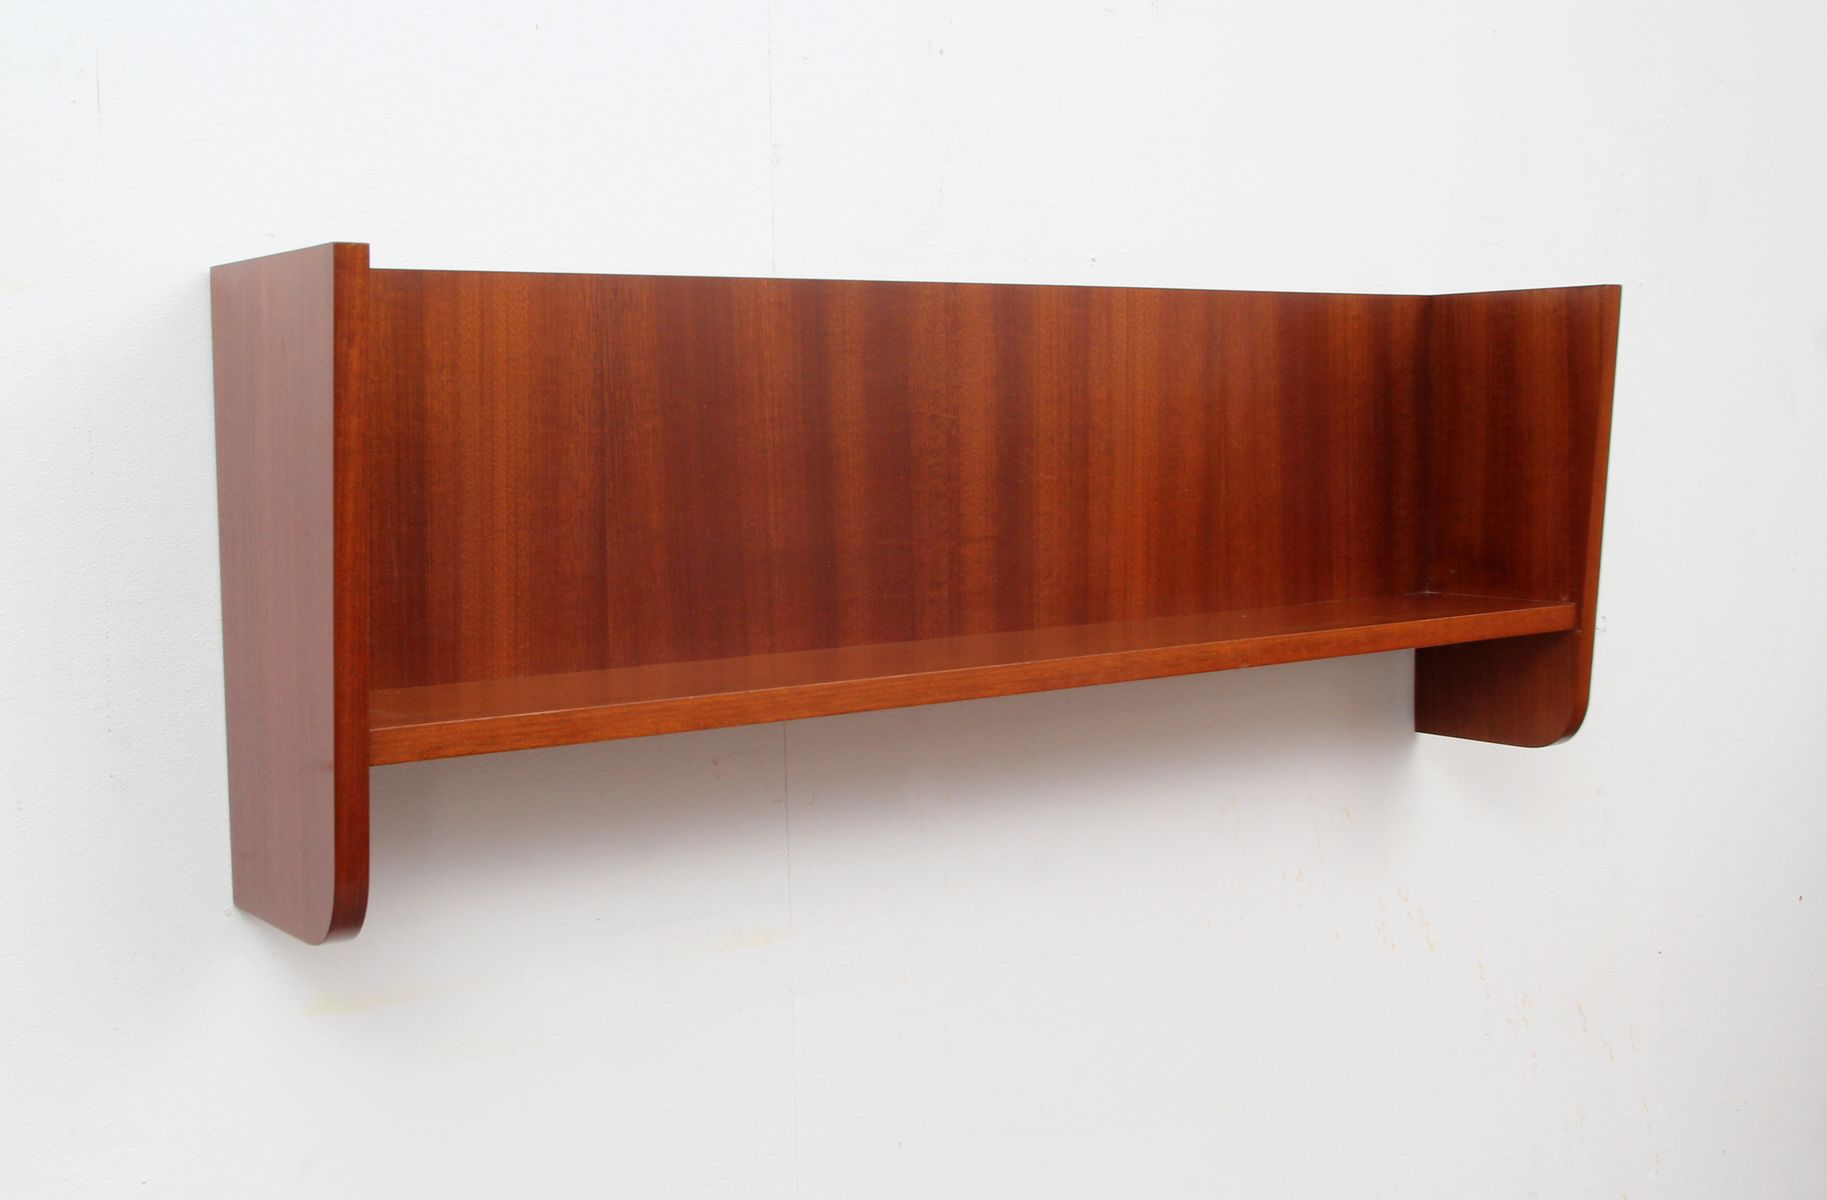 vintage b cherregal 1950er bei pamono kaufen. Black Bedroom Furniture Sets. Home Design Ideas